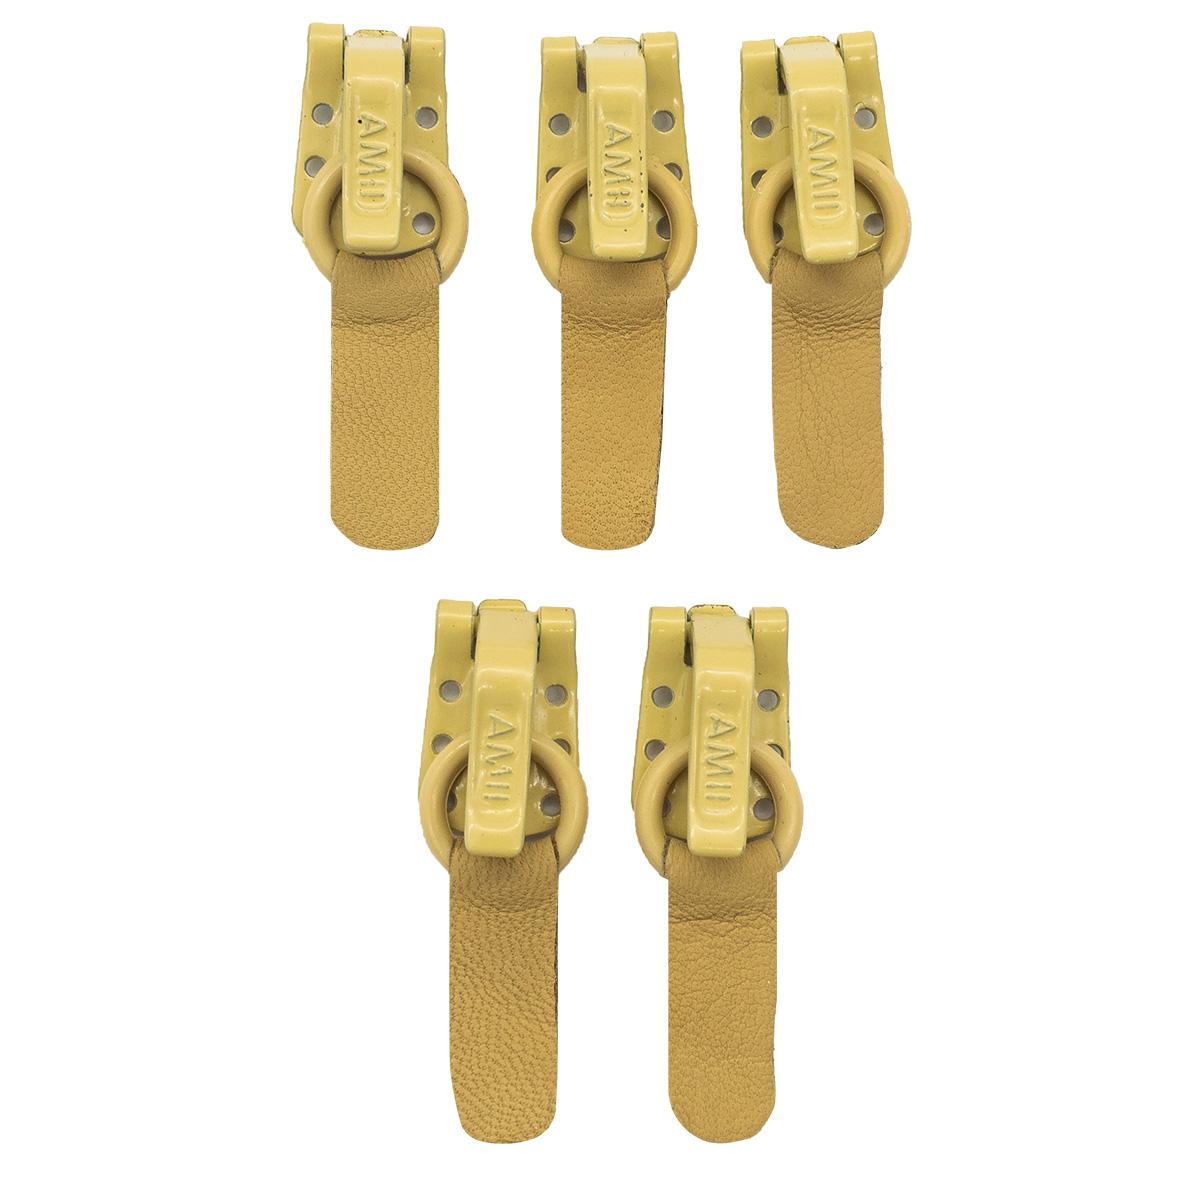 88-001 Крючок шубный Ammi 5 шт/упак (1001 светло-бежевый)